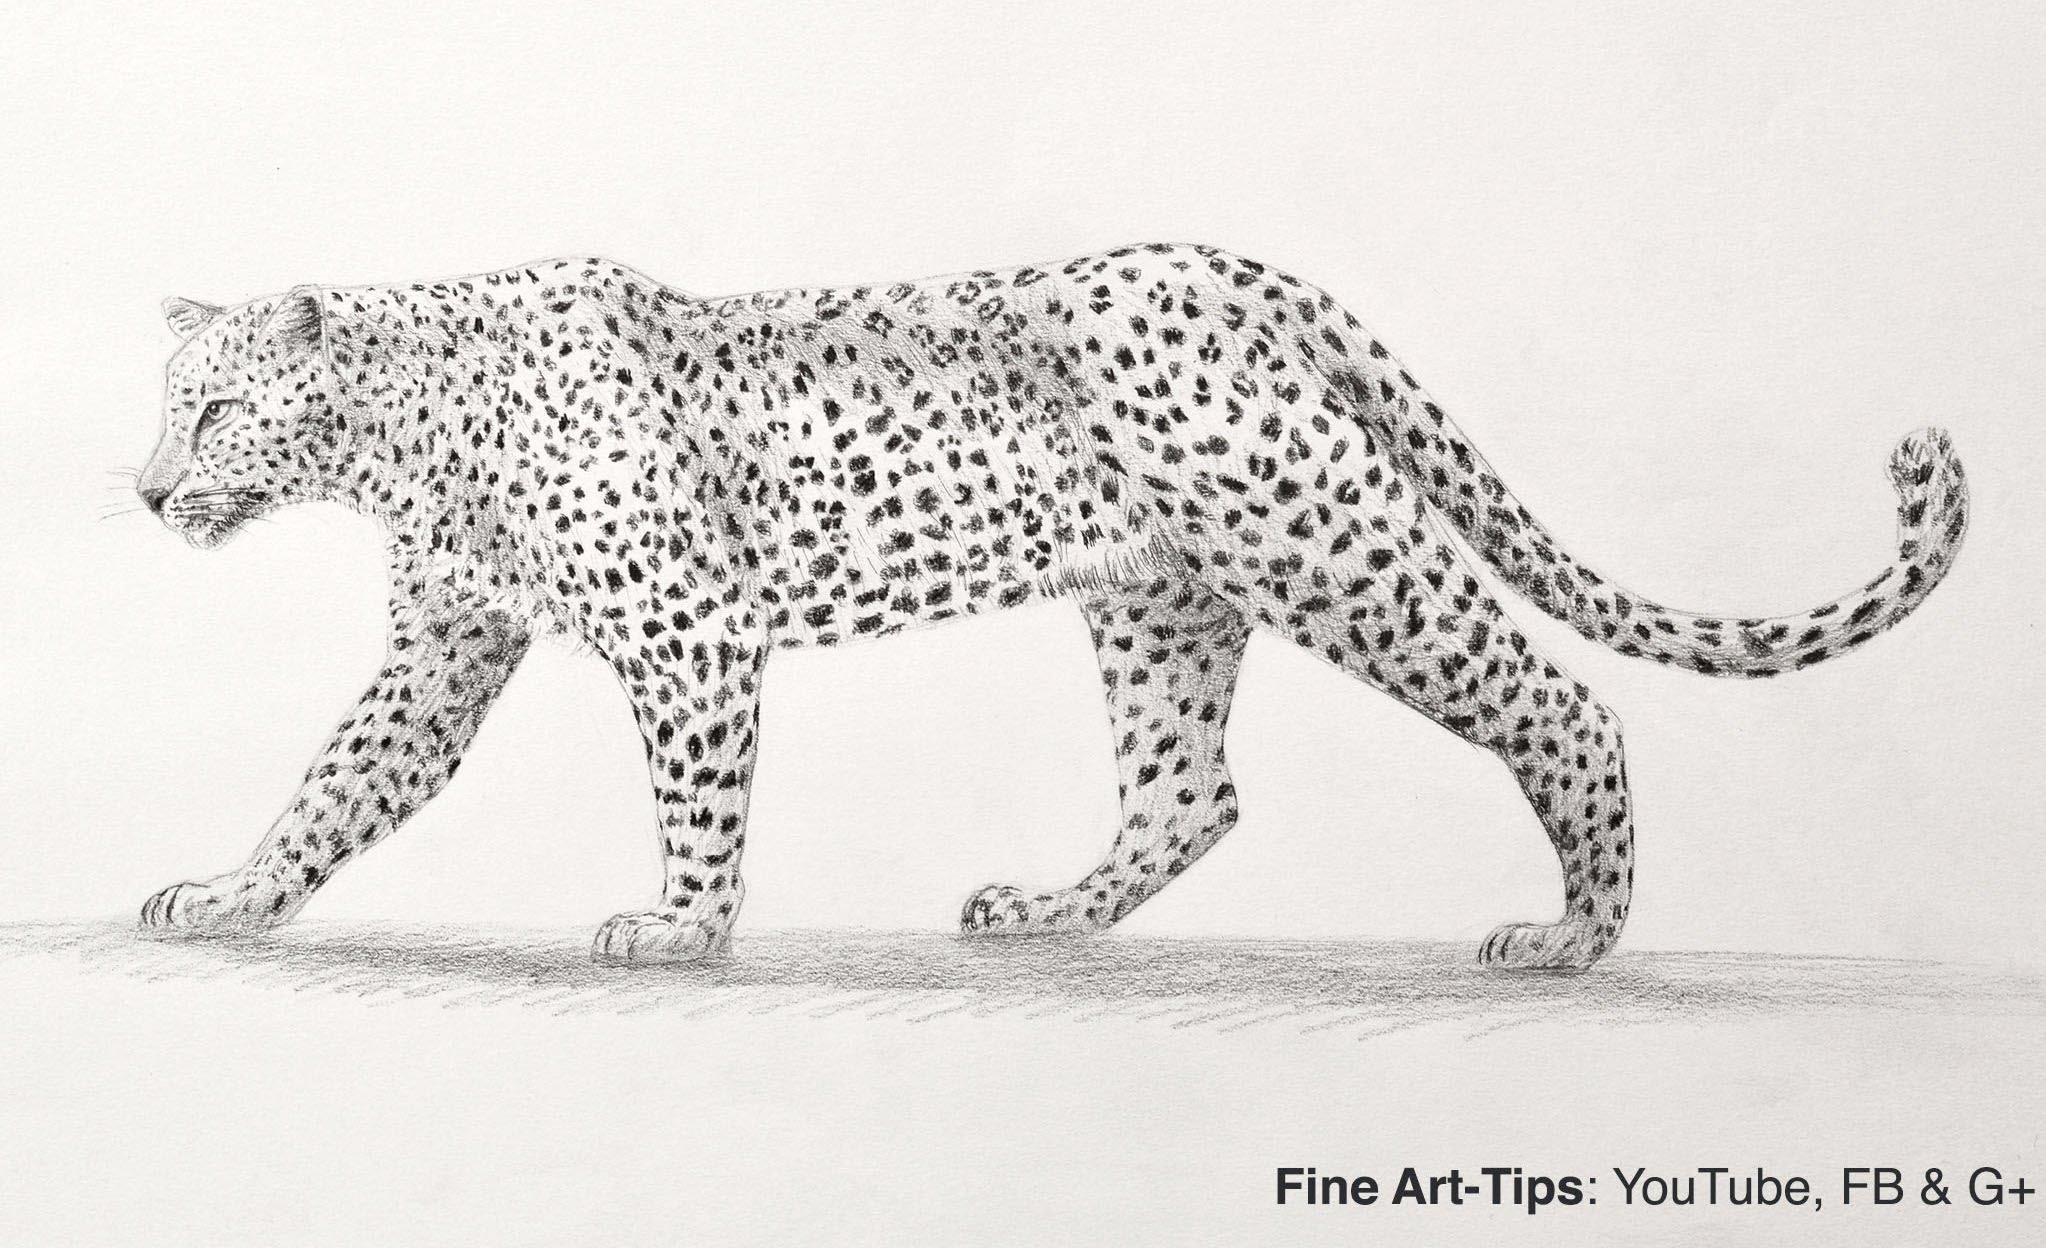 Drawn leopard Cat Big With Pencil Big